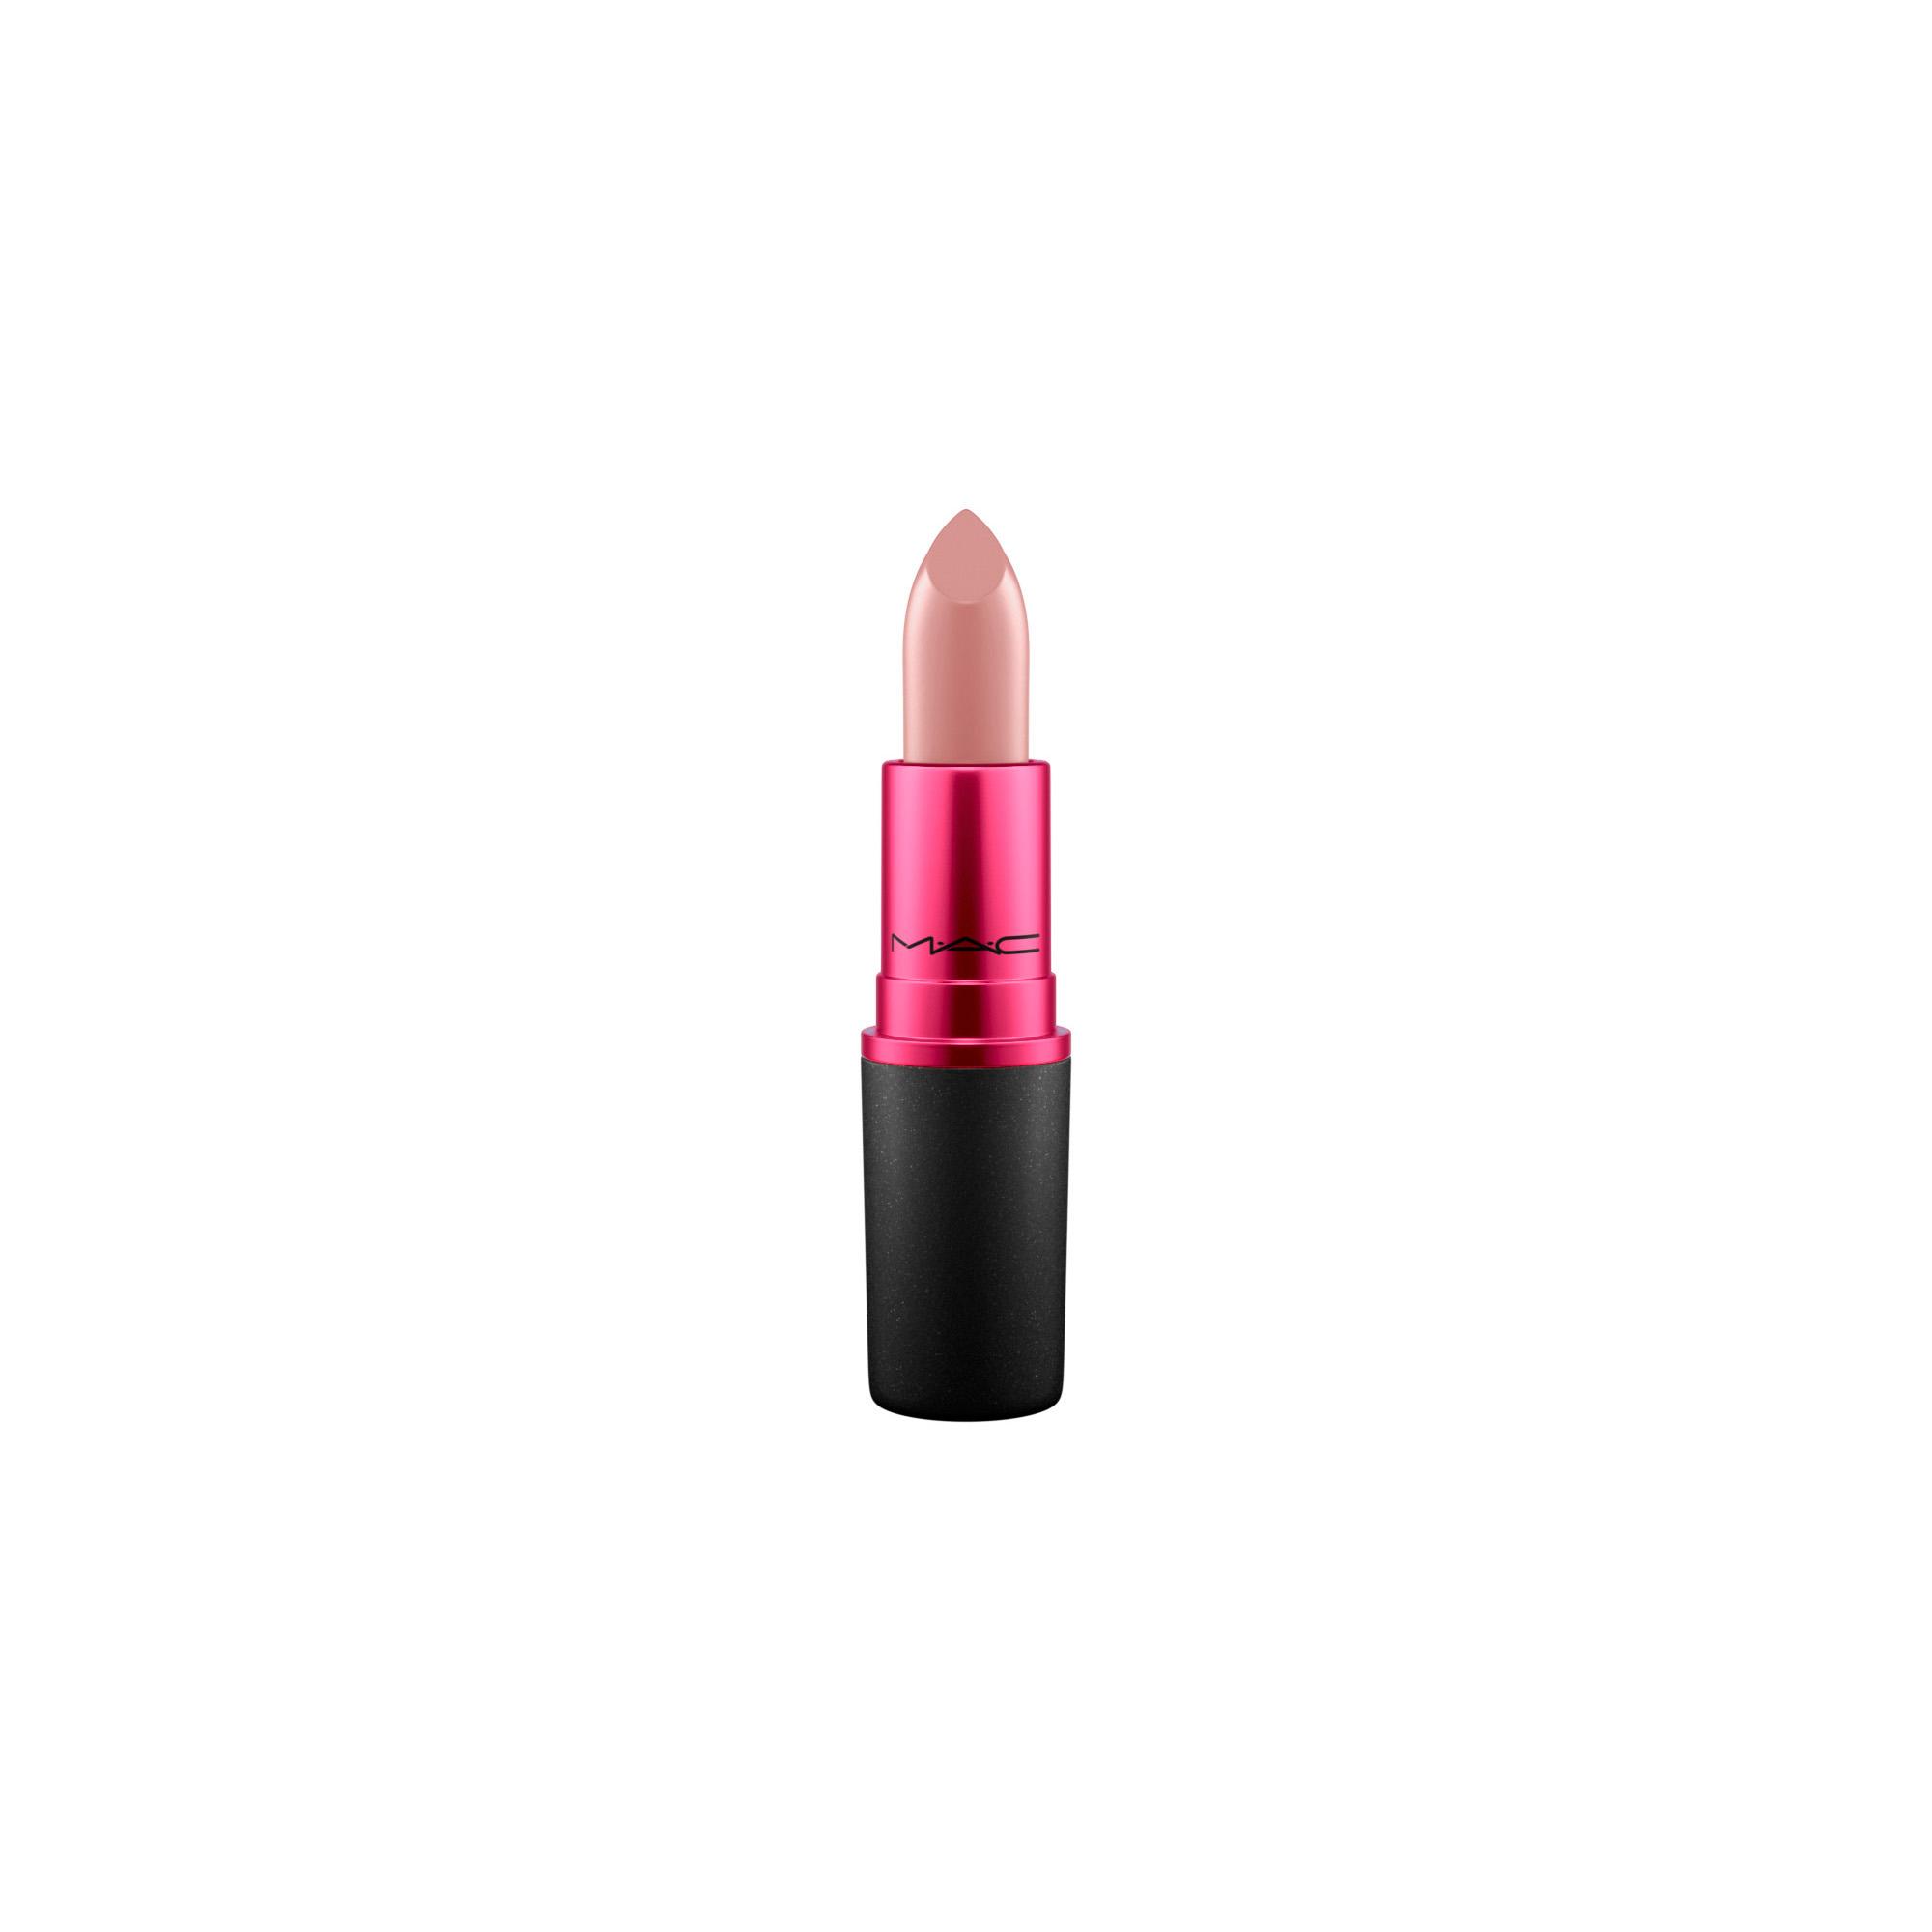 Lipstick Viva Glam Viva Glam II